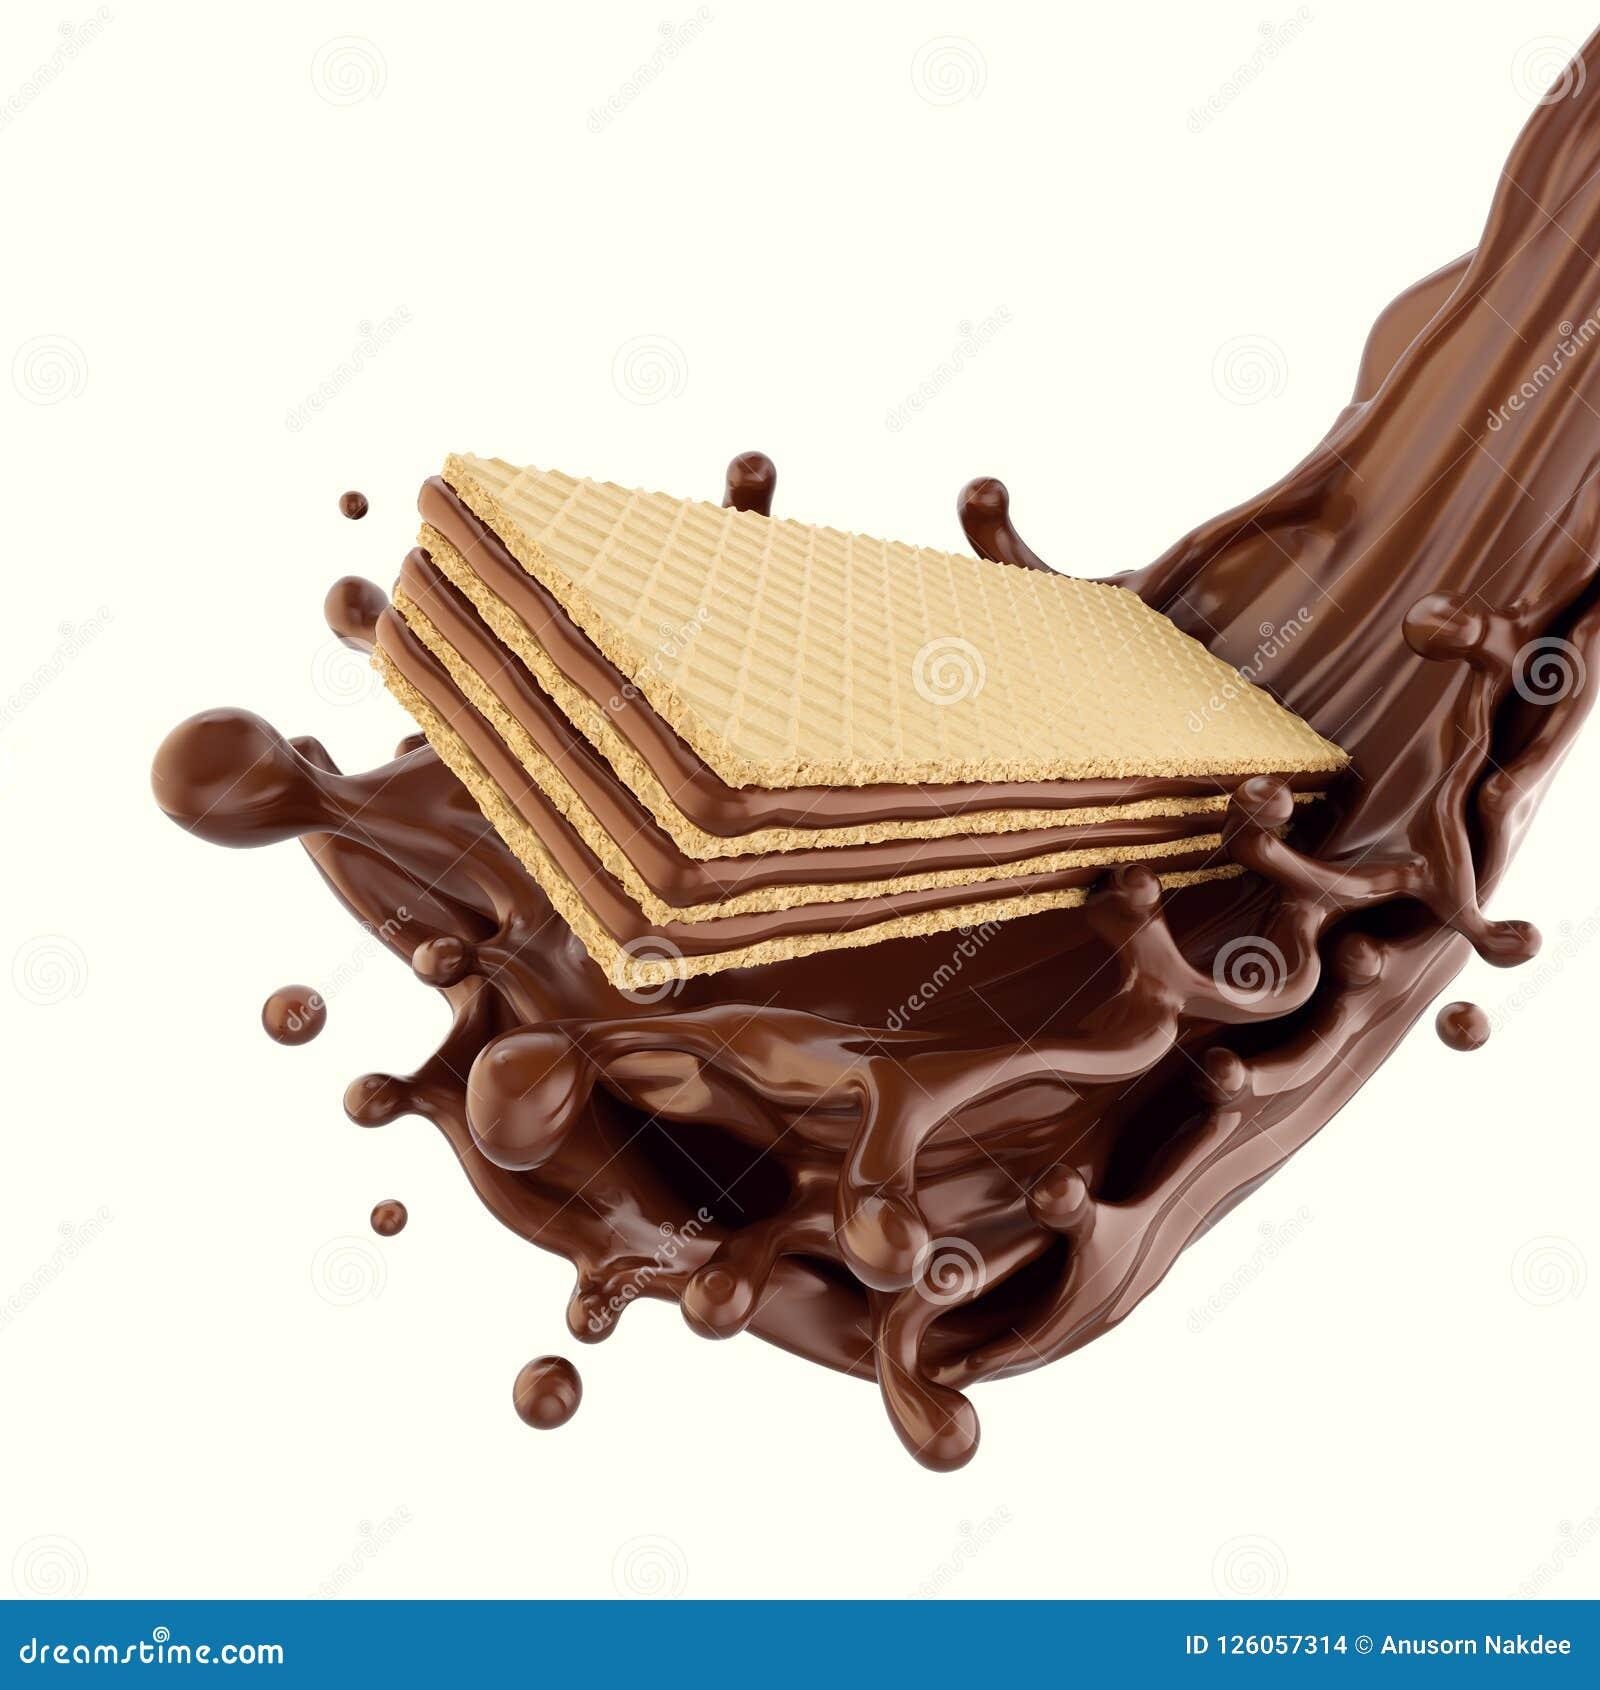 Cookie Chocolate wafer with chocolate syrup splashing.